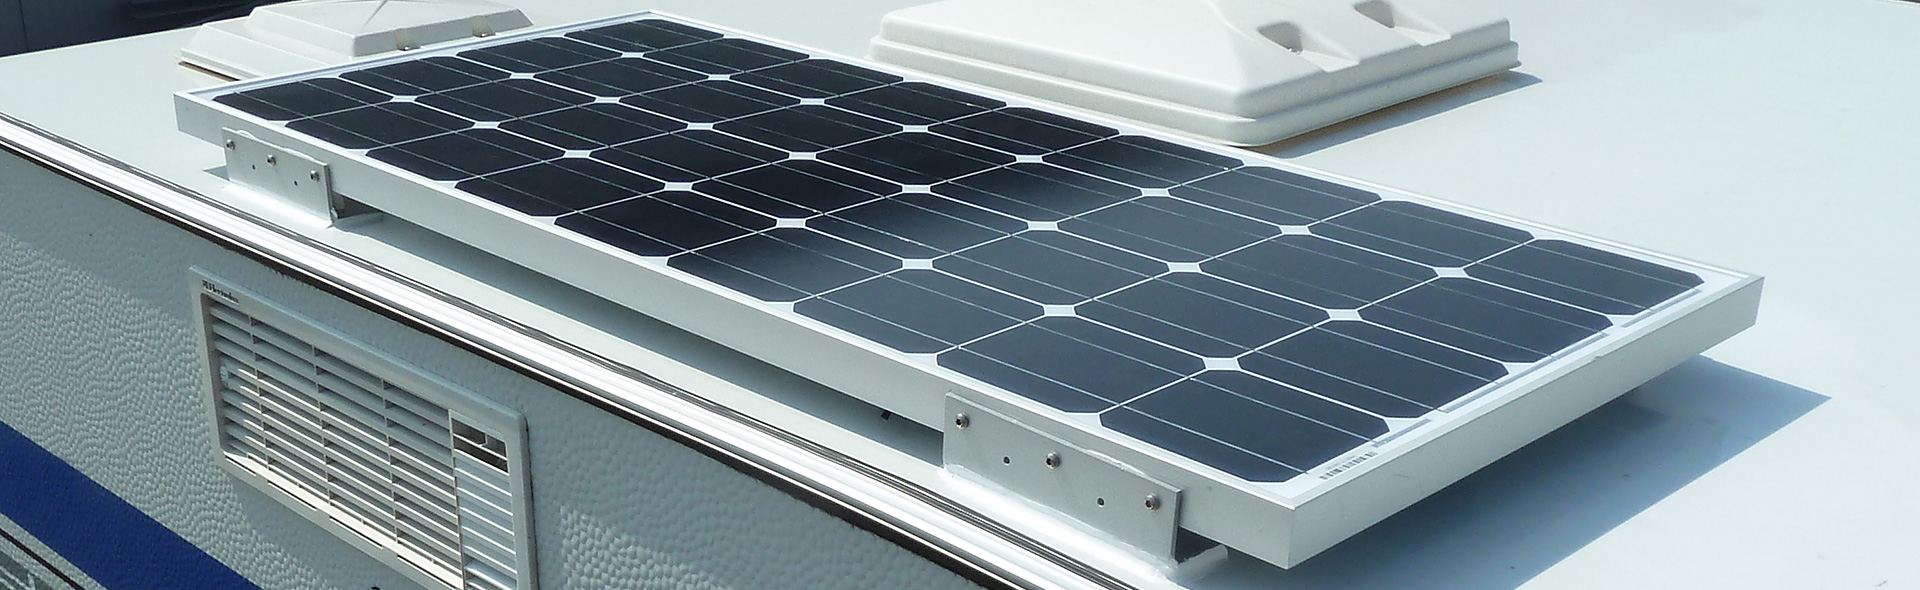 Solarenergie Elektro- & Sat-technik 200w 12v Solar Spar Set Für Kastenfahrzeuge Komplett Solaranlage 200 Watt Top